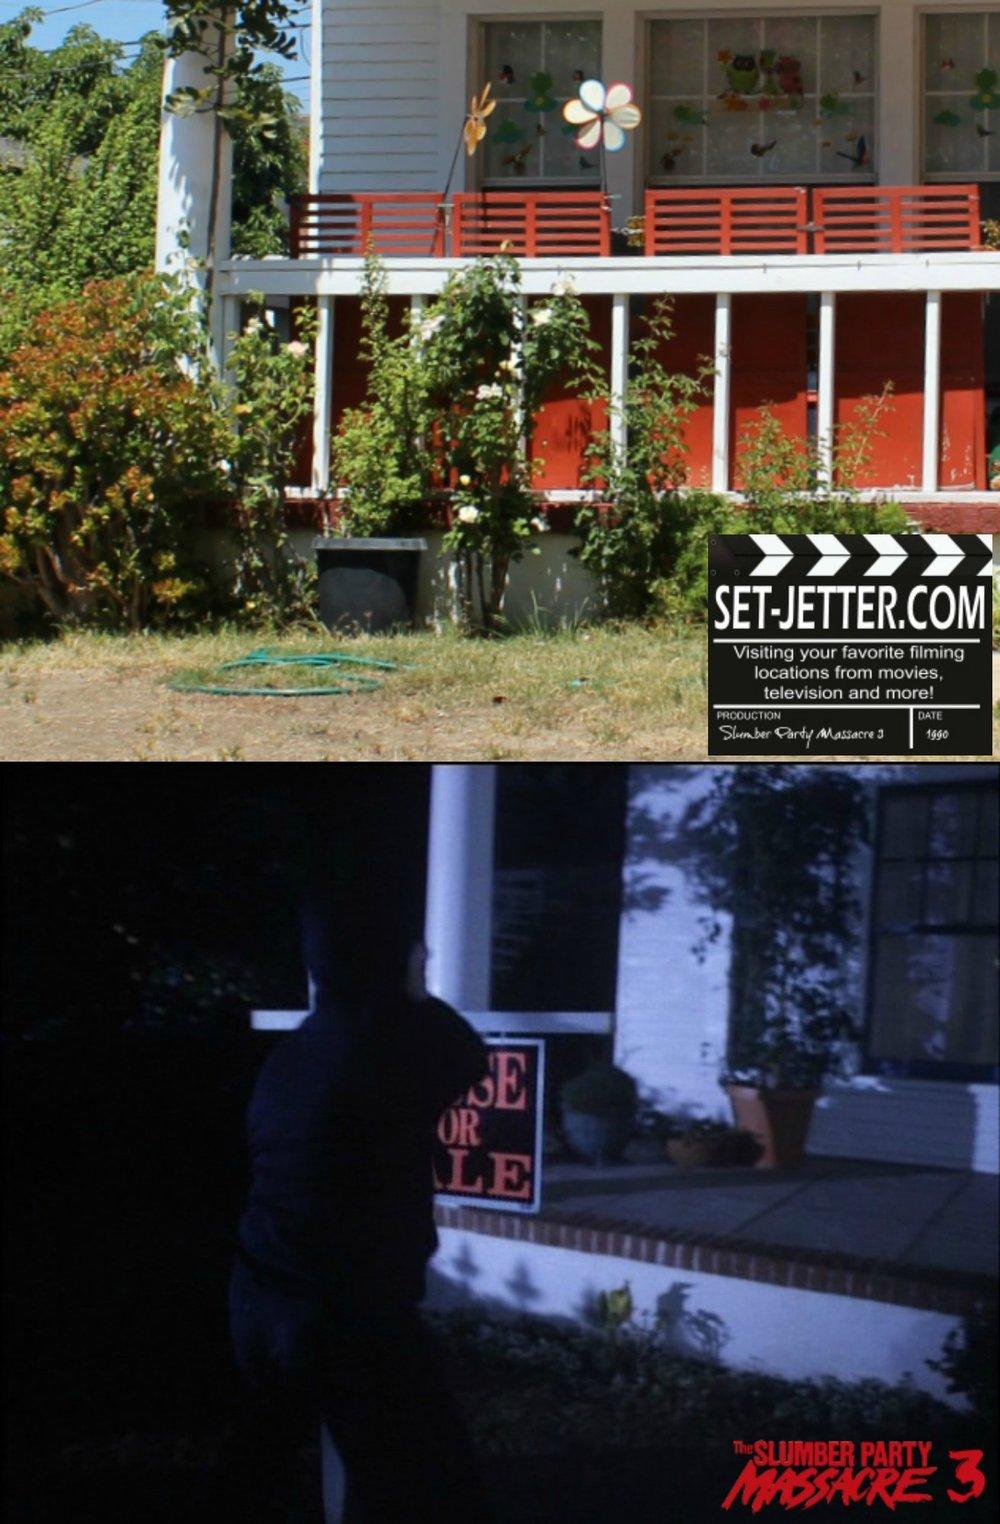 Slumber Party Massacre III comparison 146.jpg